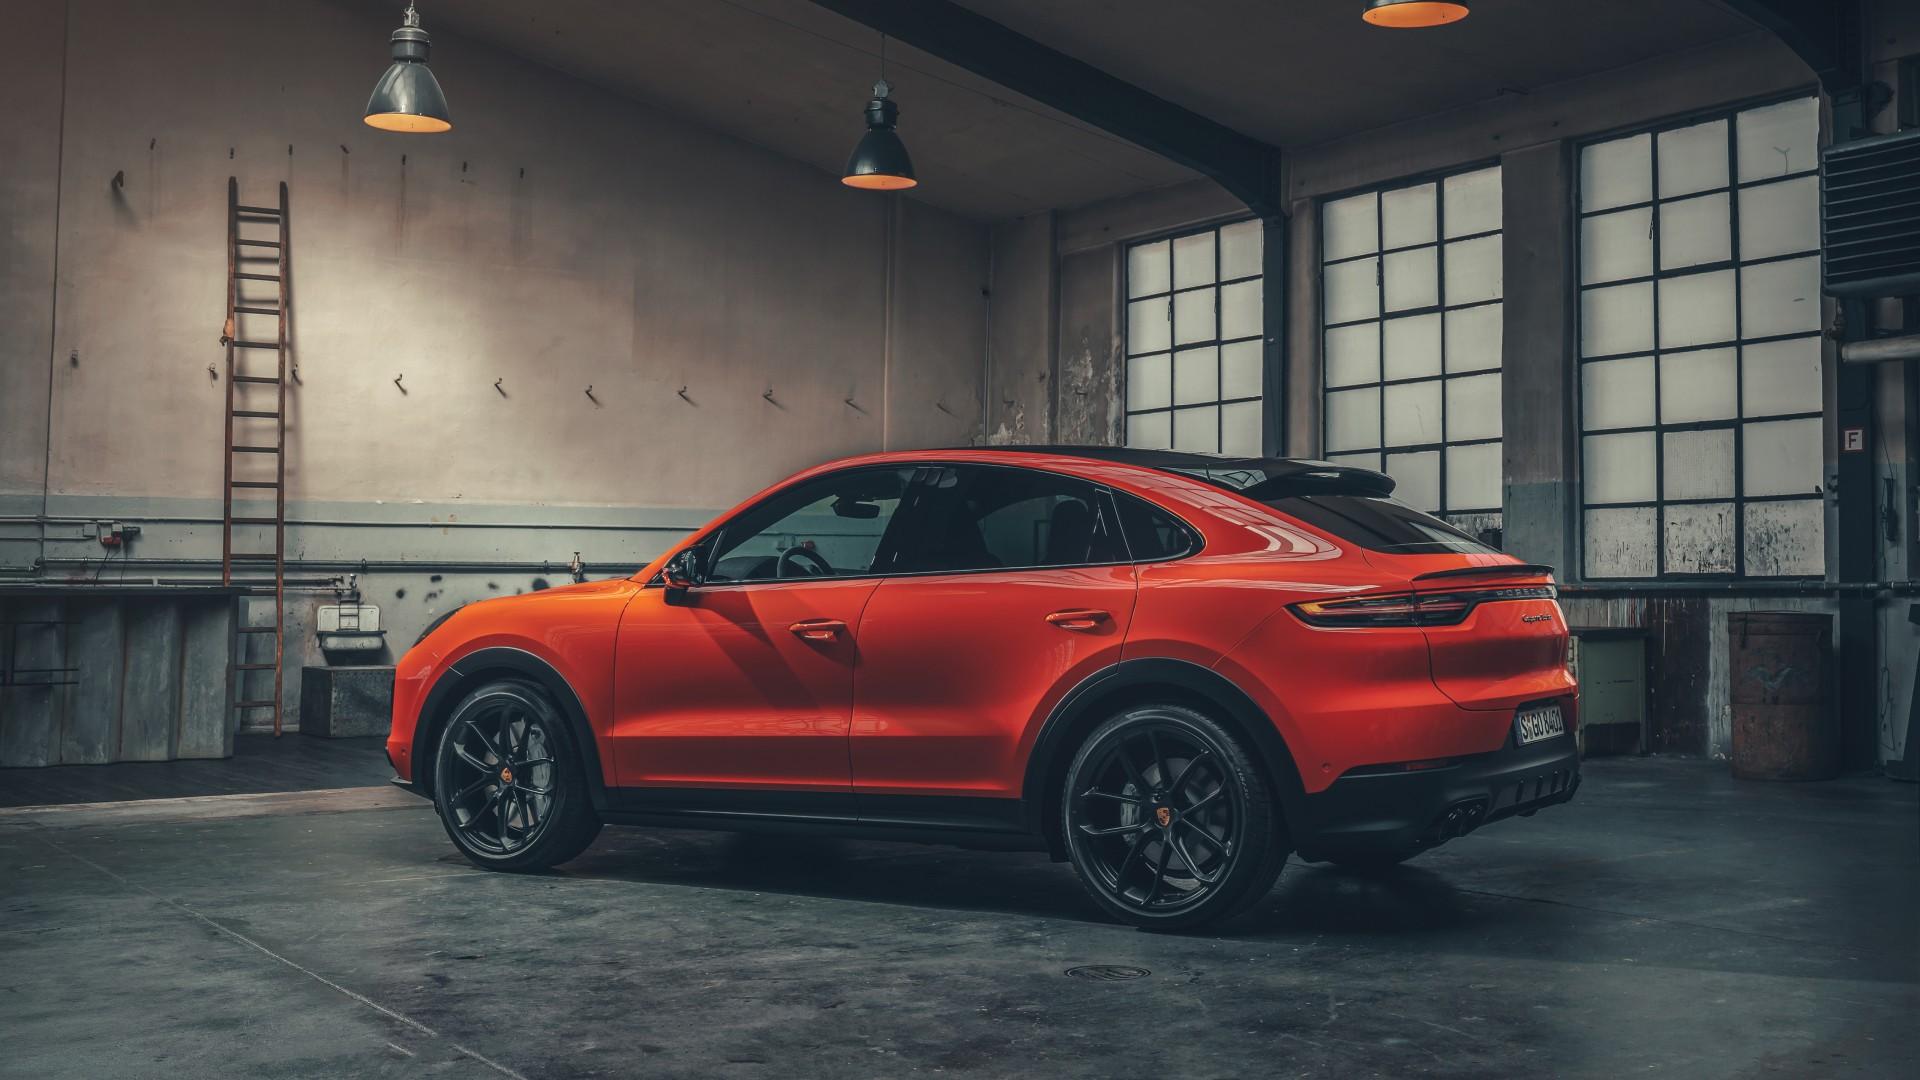 Porsche Cayenne Turbo Coupe 2019 4K 2 Wallpaper   HD Car Wallpapers   ID #12332